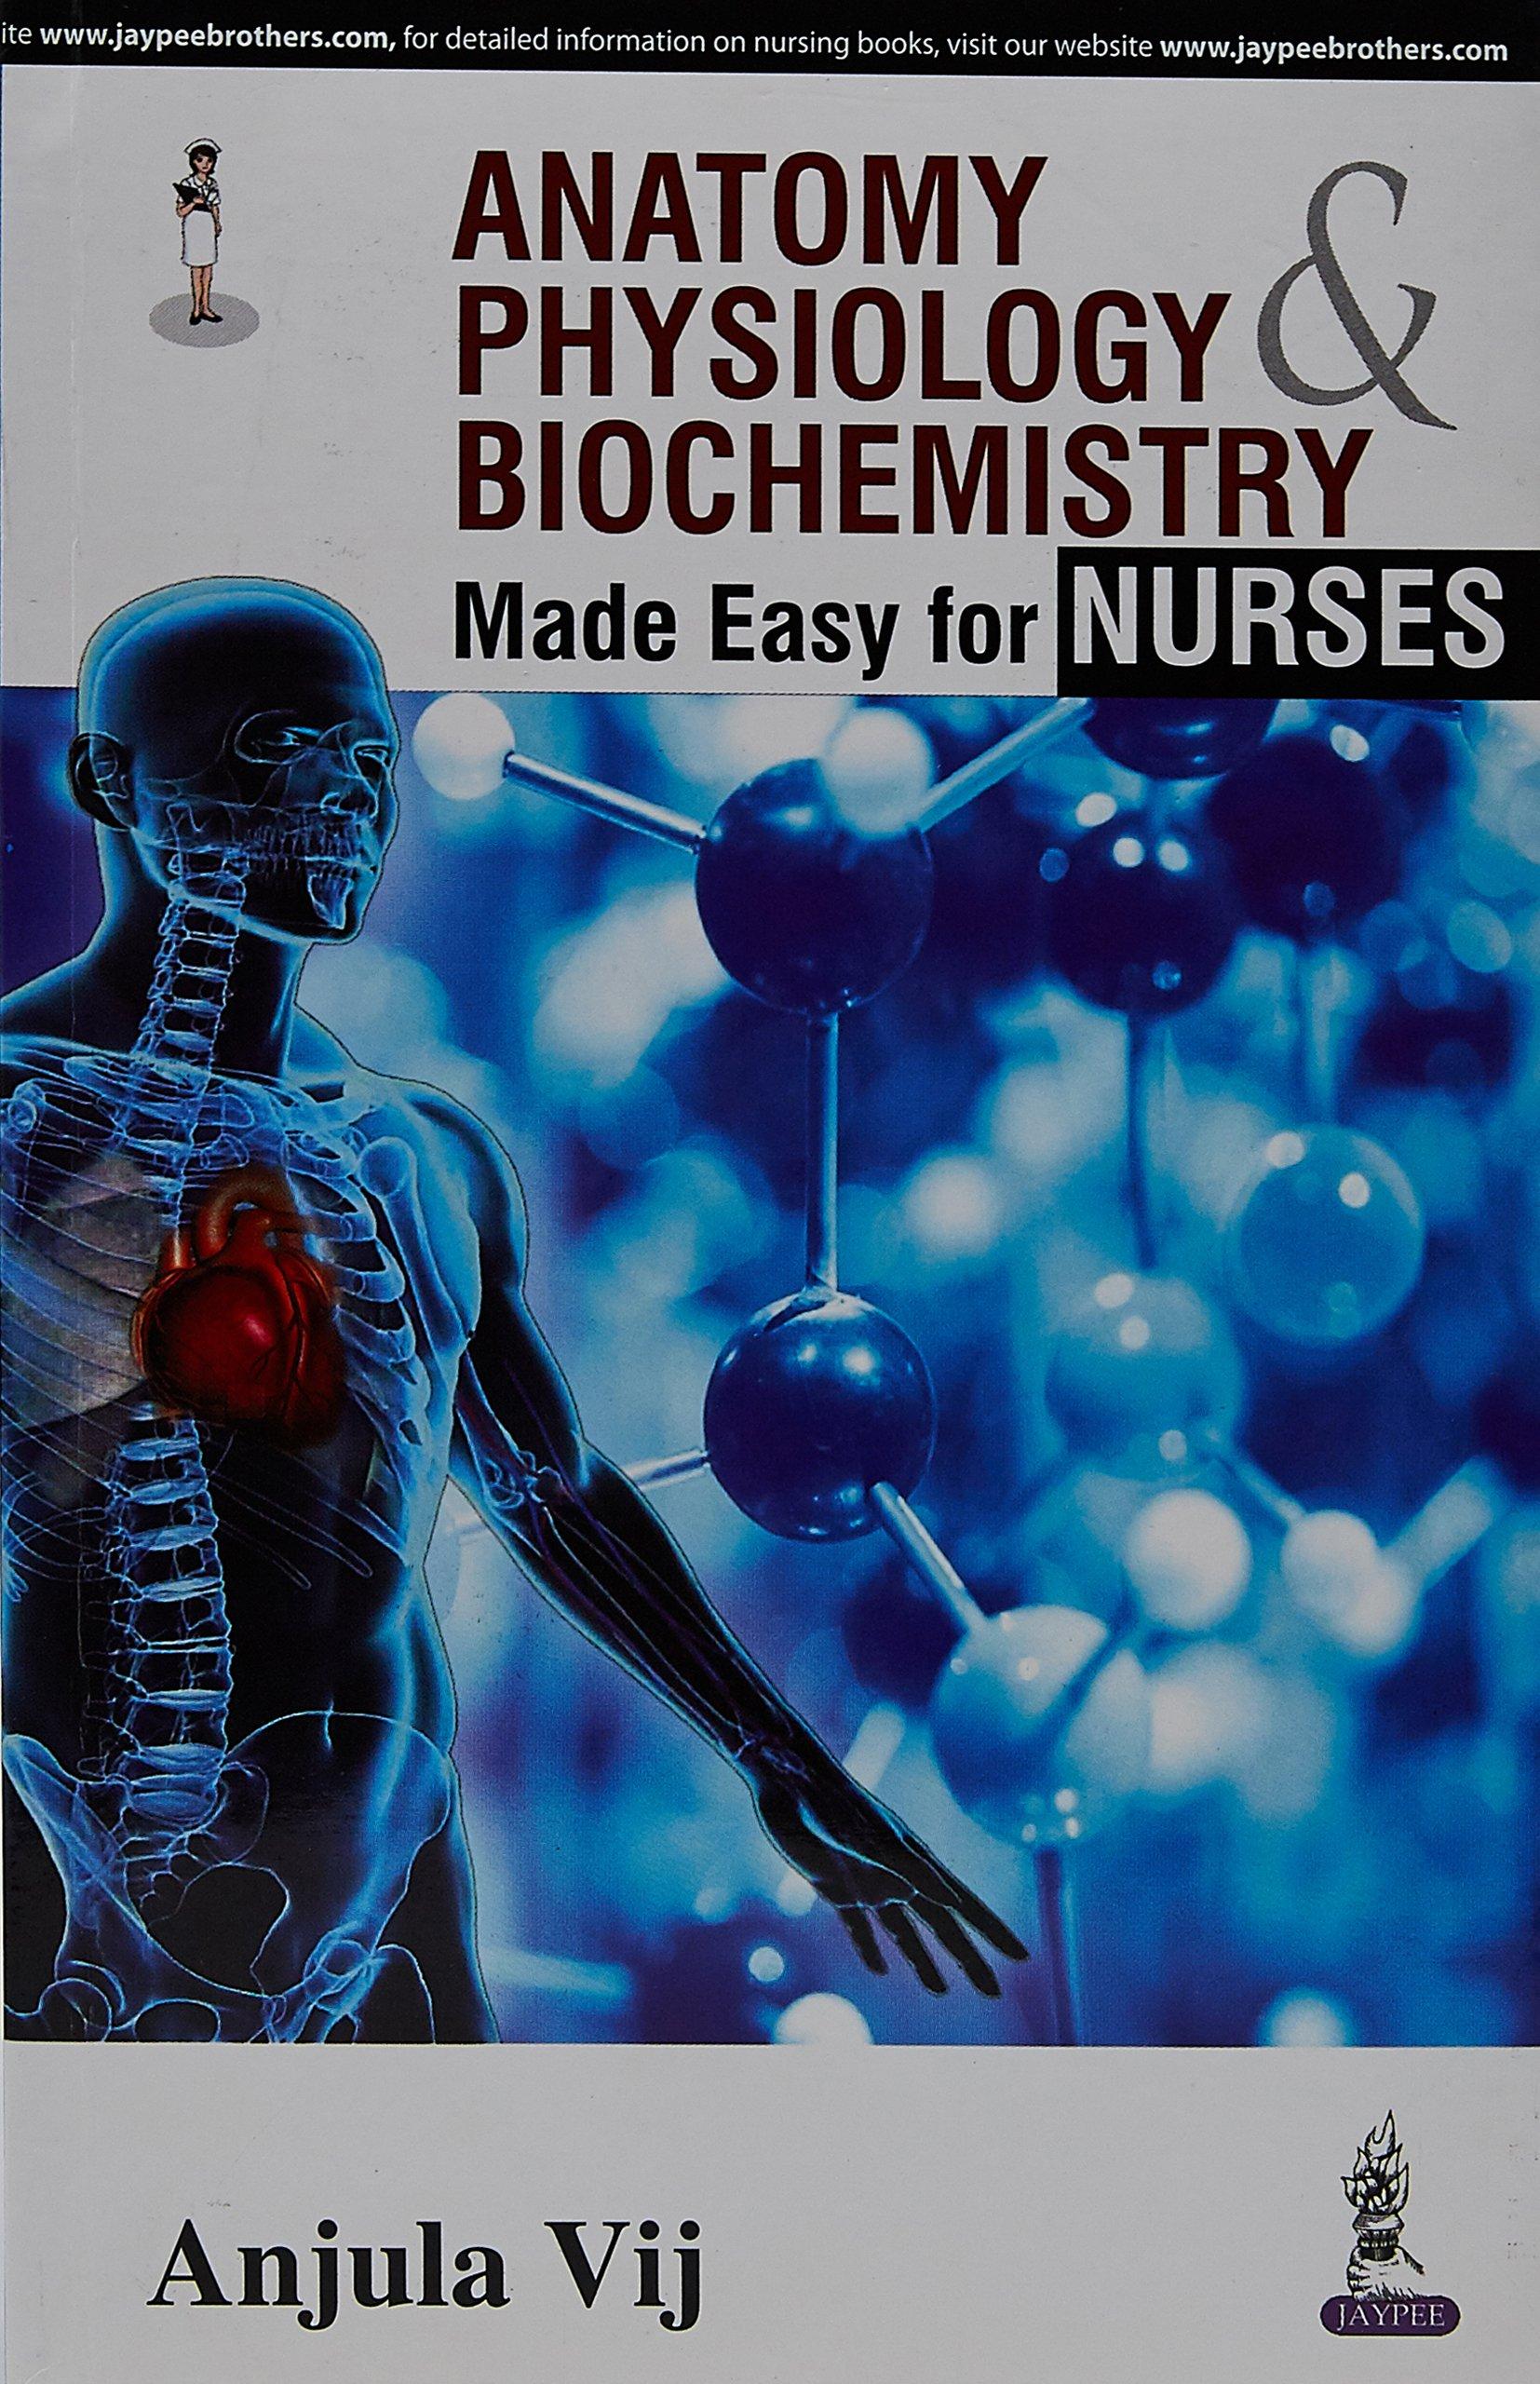 Anatomy, Physiology & Biochemistry Made Easy for Nurses: Anjula Vij ...